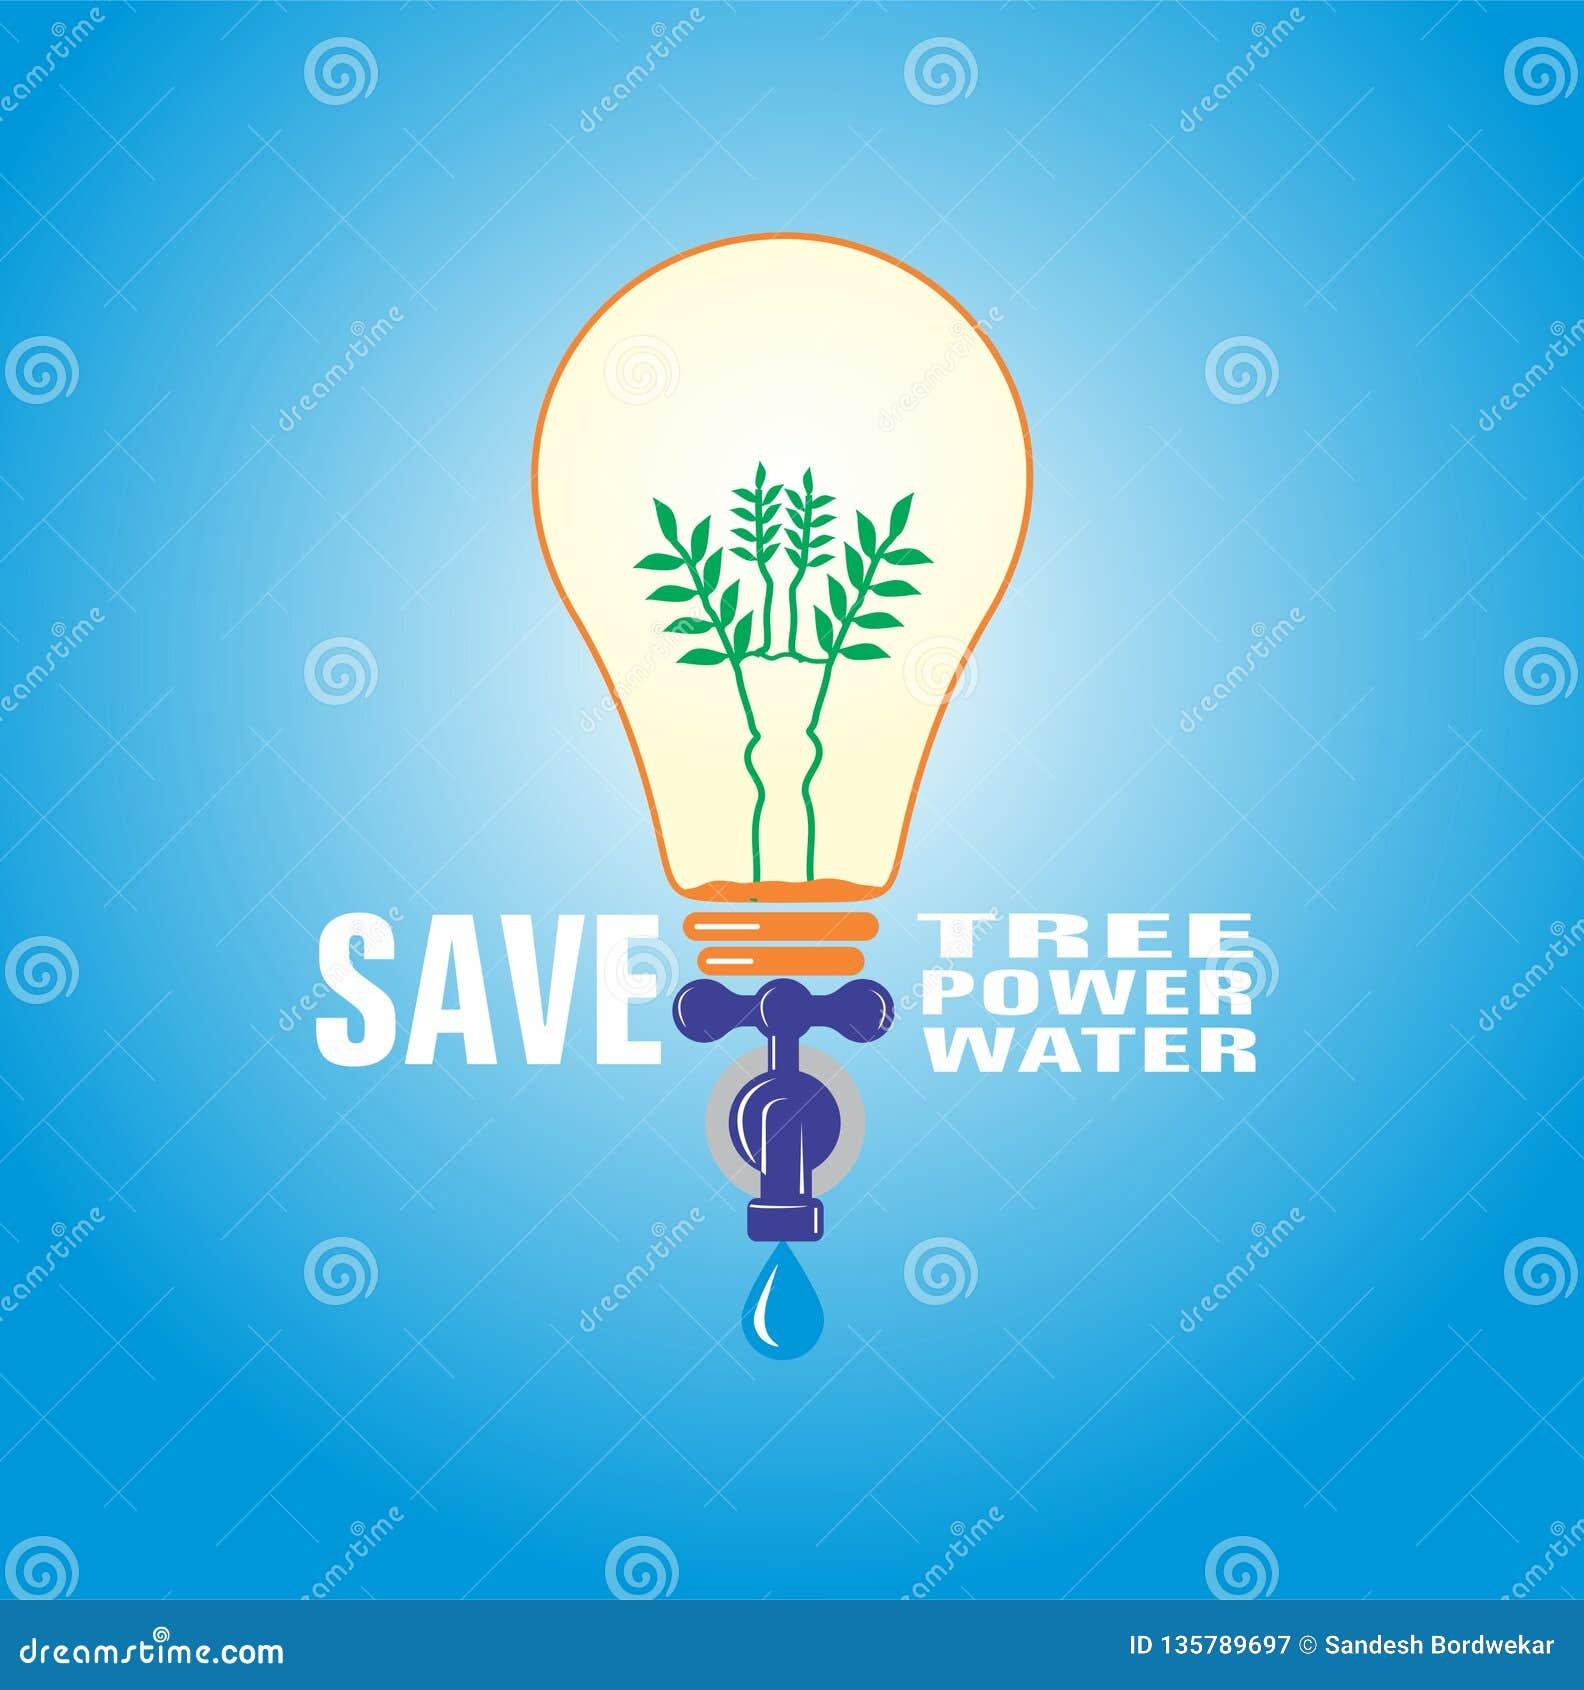 MUNDO abstracto de ahorro del poder de agua de la naturaleza